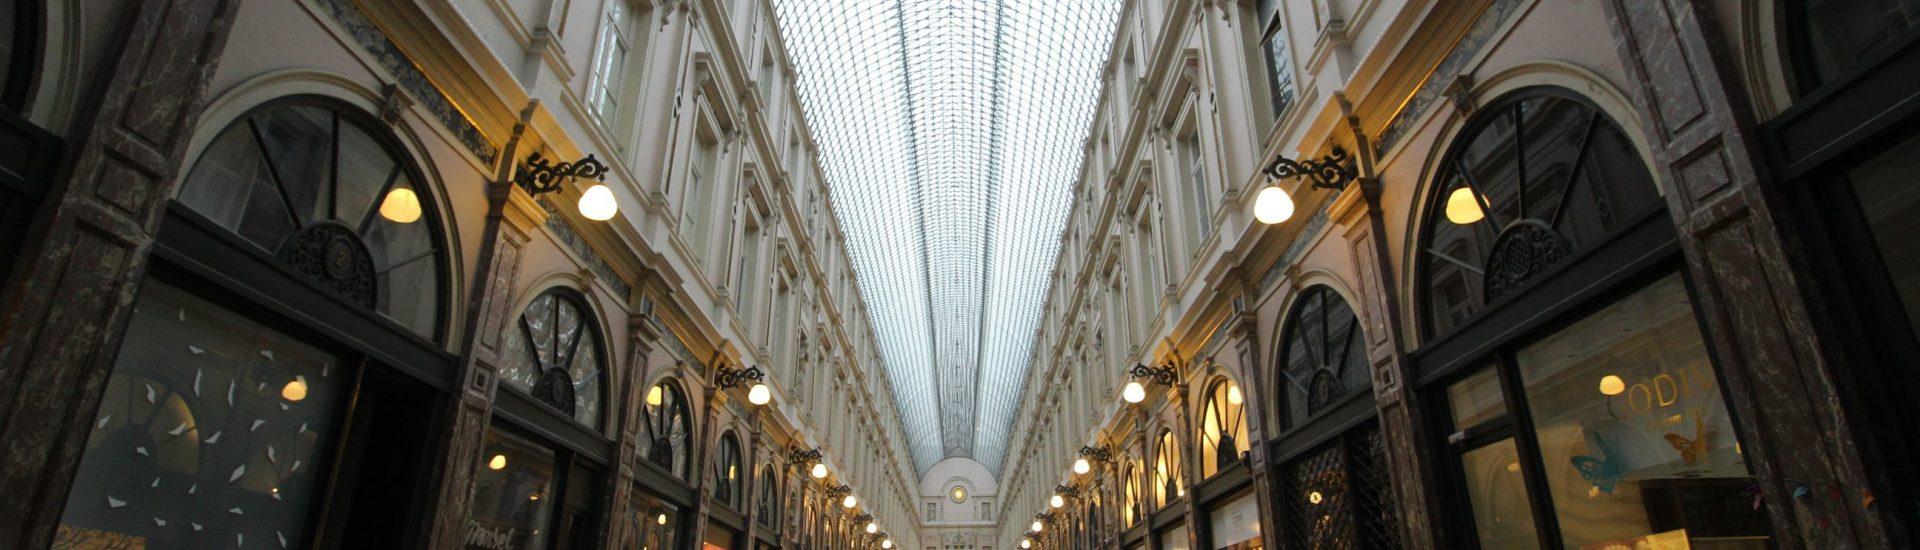 Galerias Bruselas